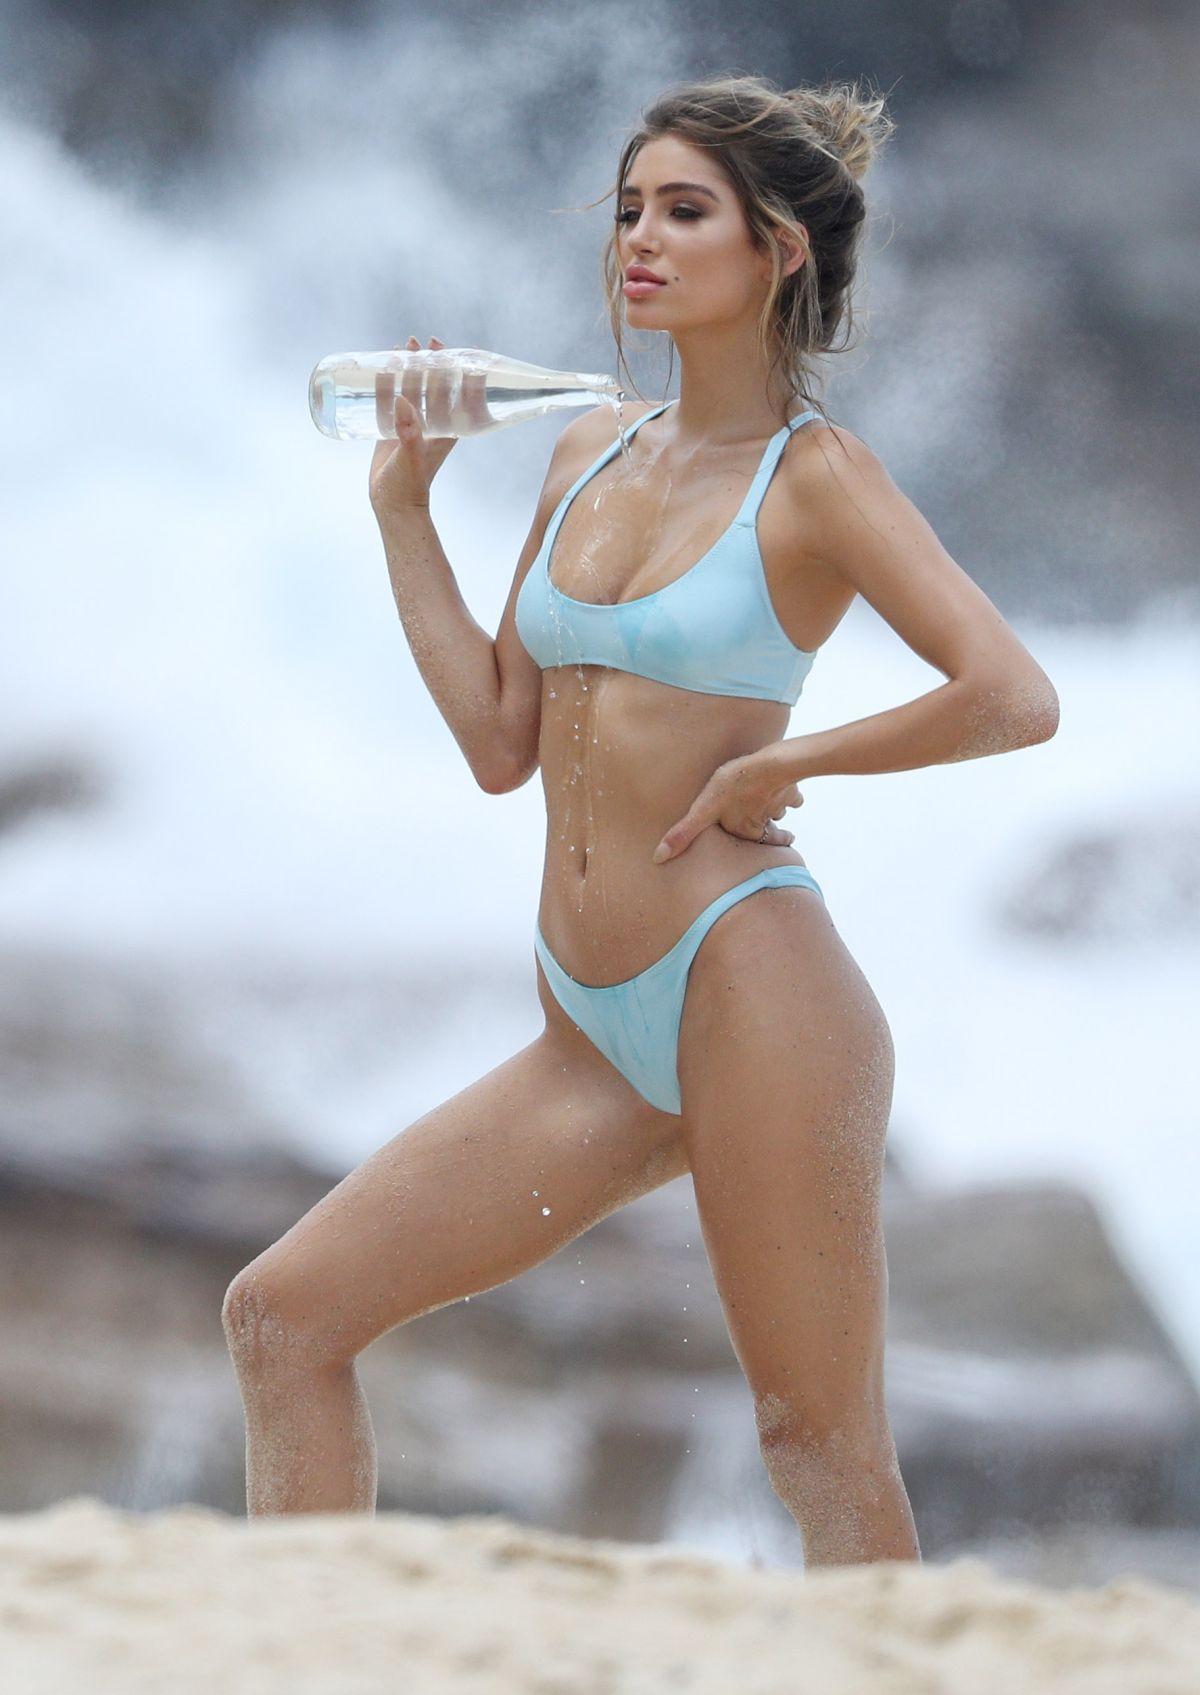 Bella Lucia Bikini Photoshoot on Bronte Beach Pic 27 of 35